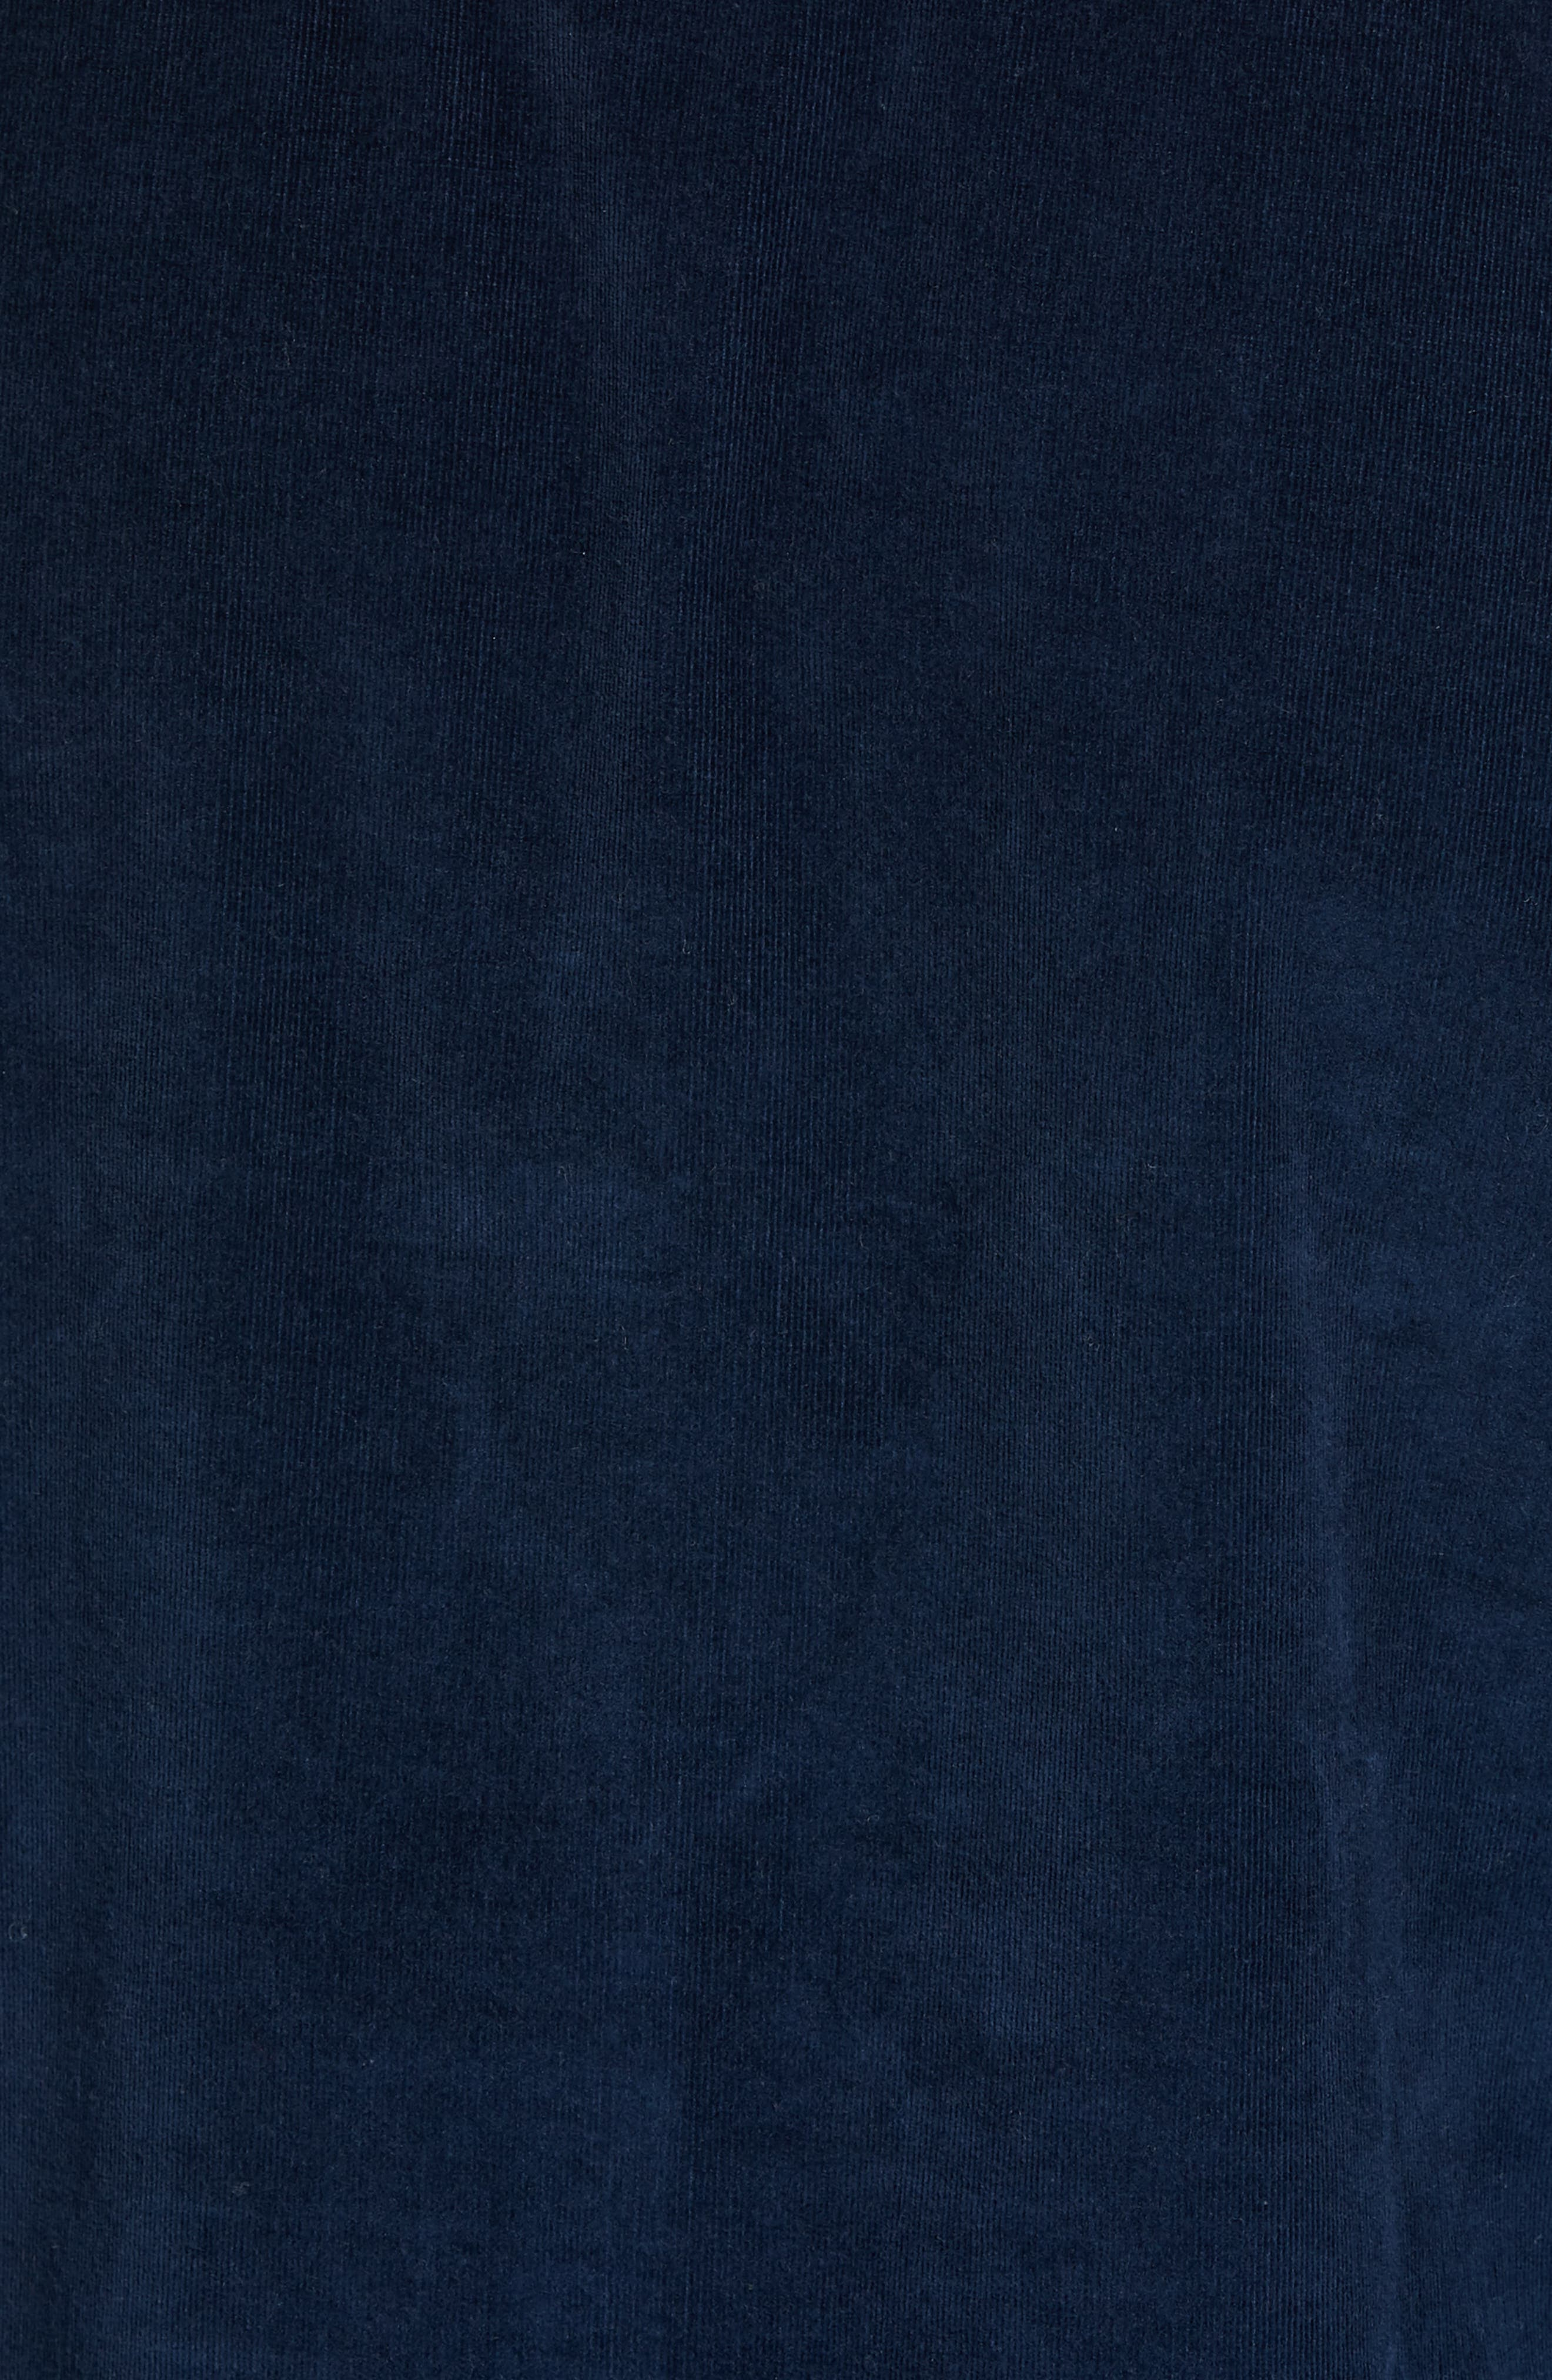 Ivy Trim Fit Corduroy Sport Shirt,                             Alternate thumbnail 5, color,                             NAVY NIGHT